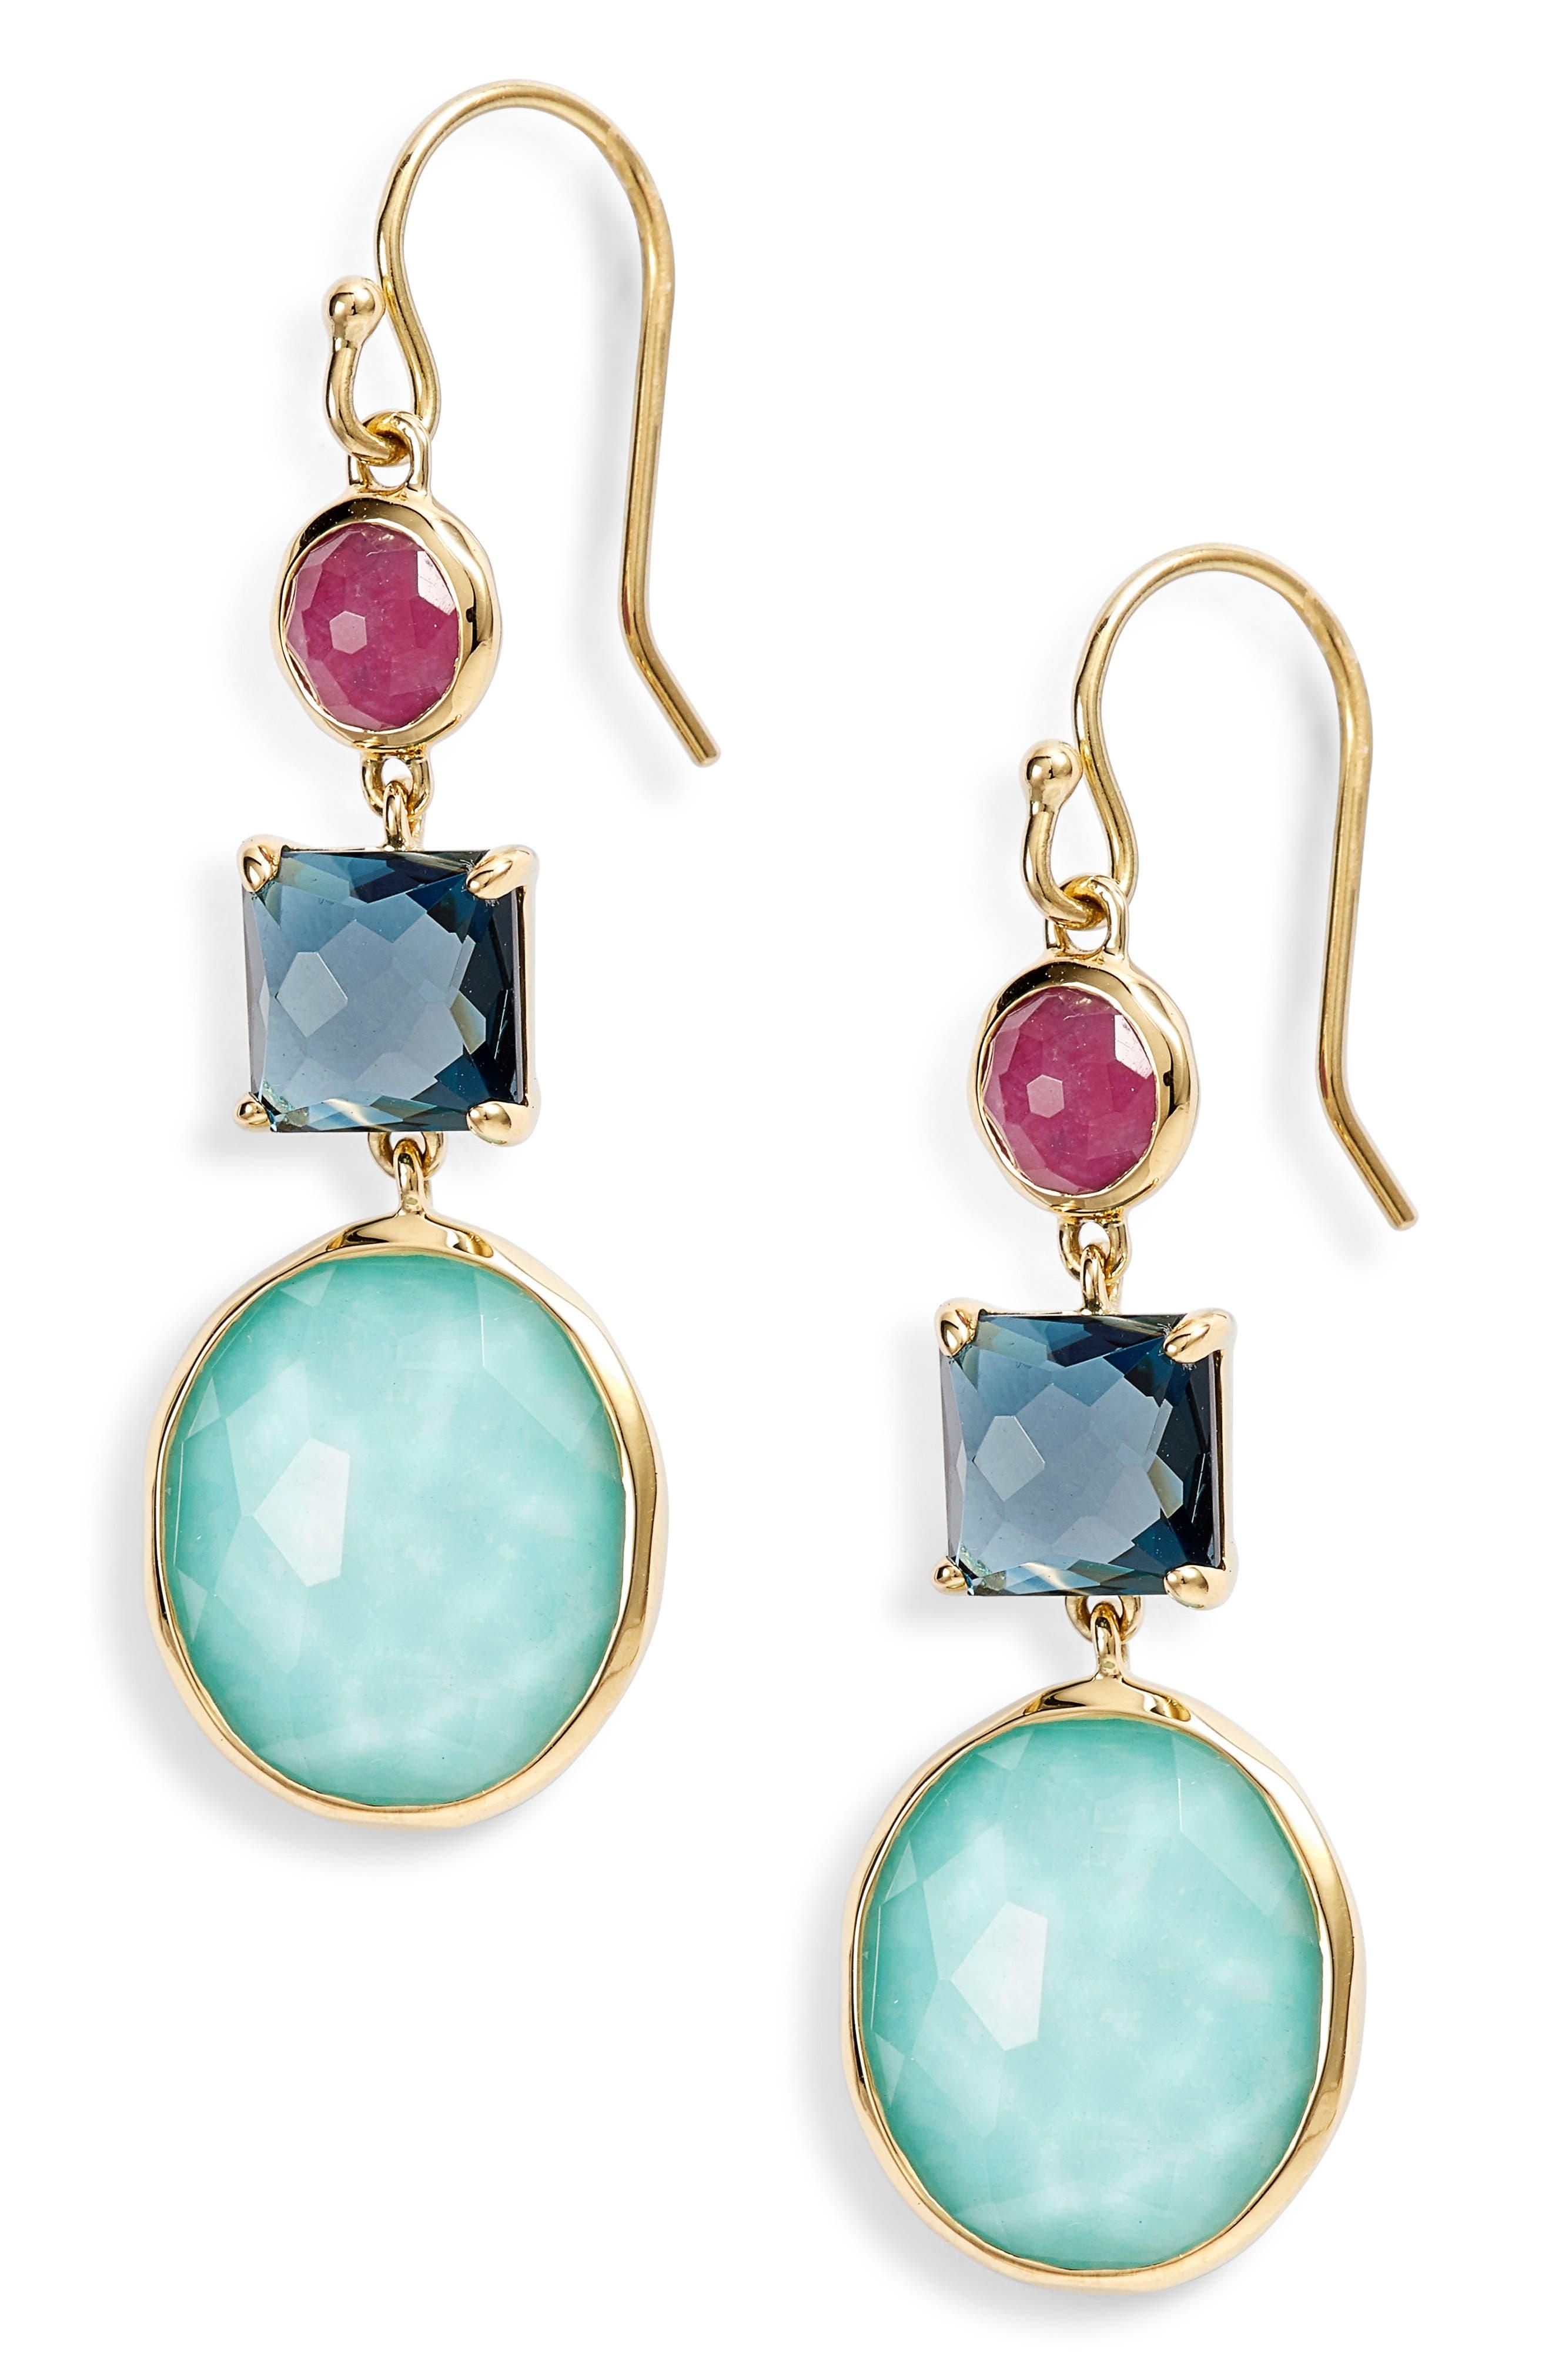 Rock Candy 18K Gold Triple Stone Earrings,                             Main thumbnail 1, color,                             GOLD/ SUMMER RAIN